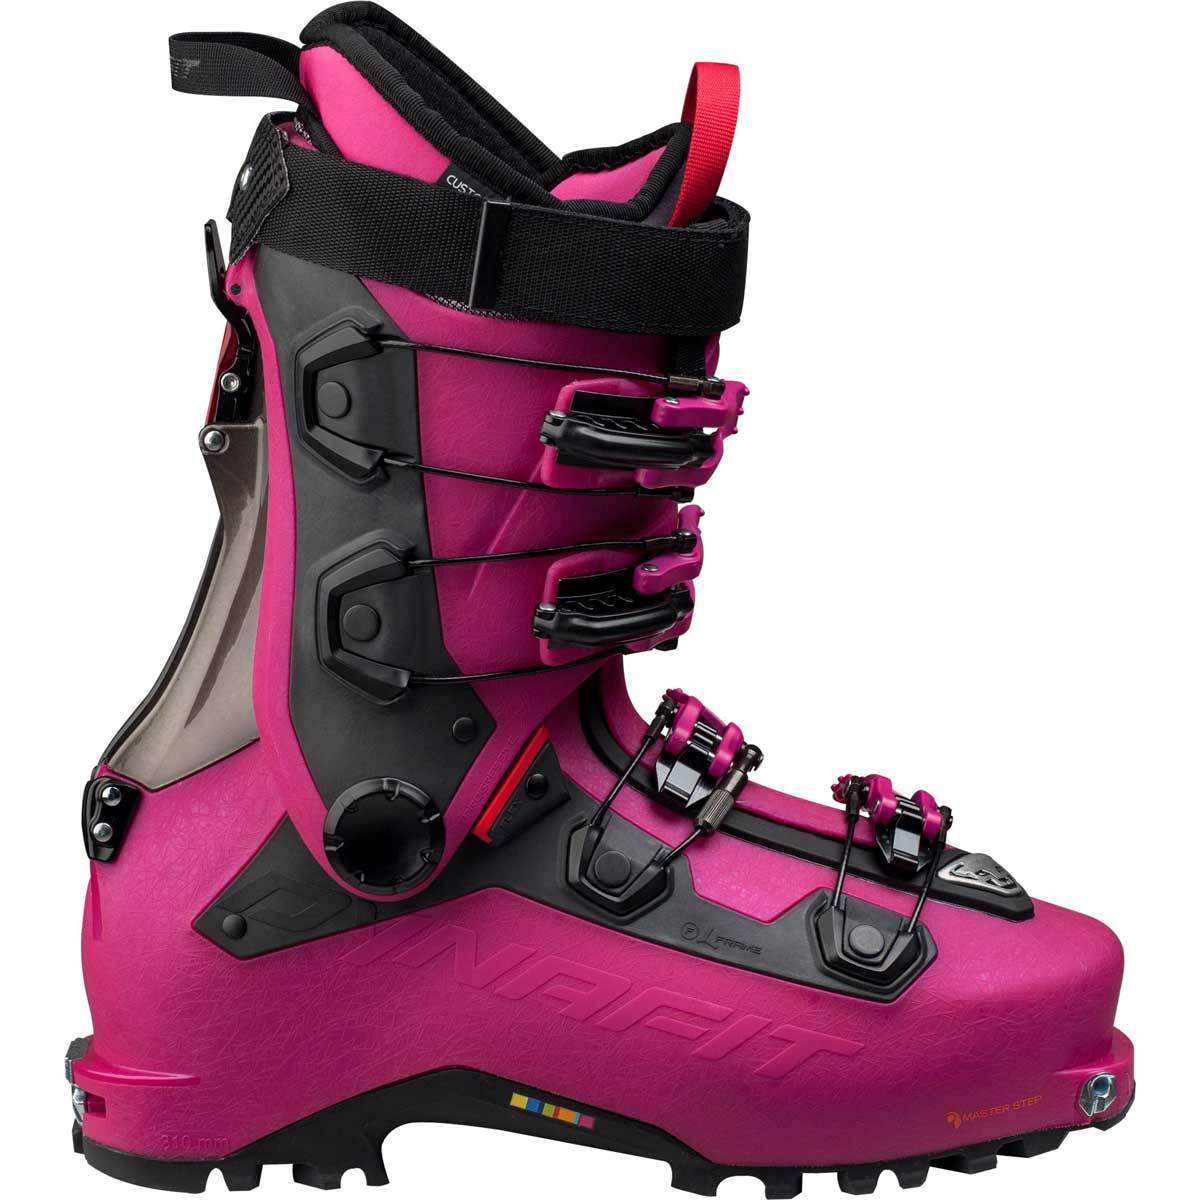 Dynafit Beast W Ski Boots On Sale Powder7 Ski Shop